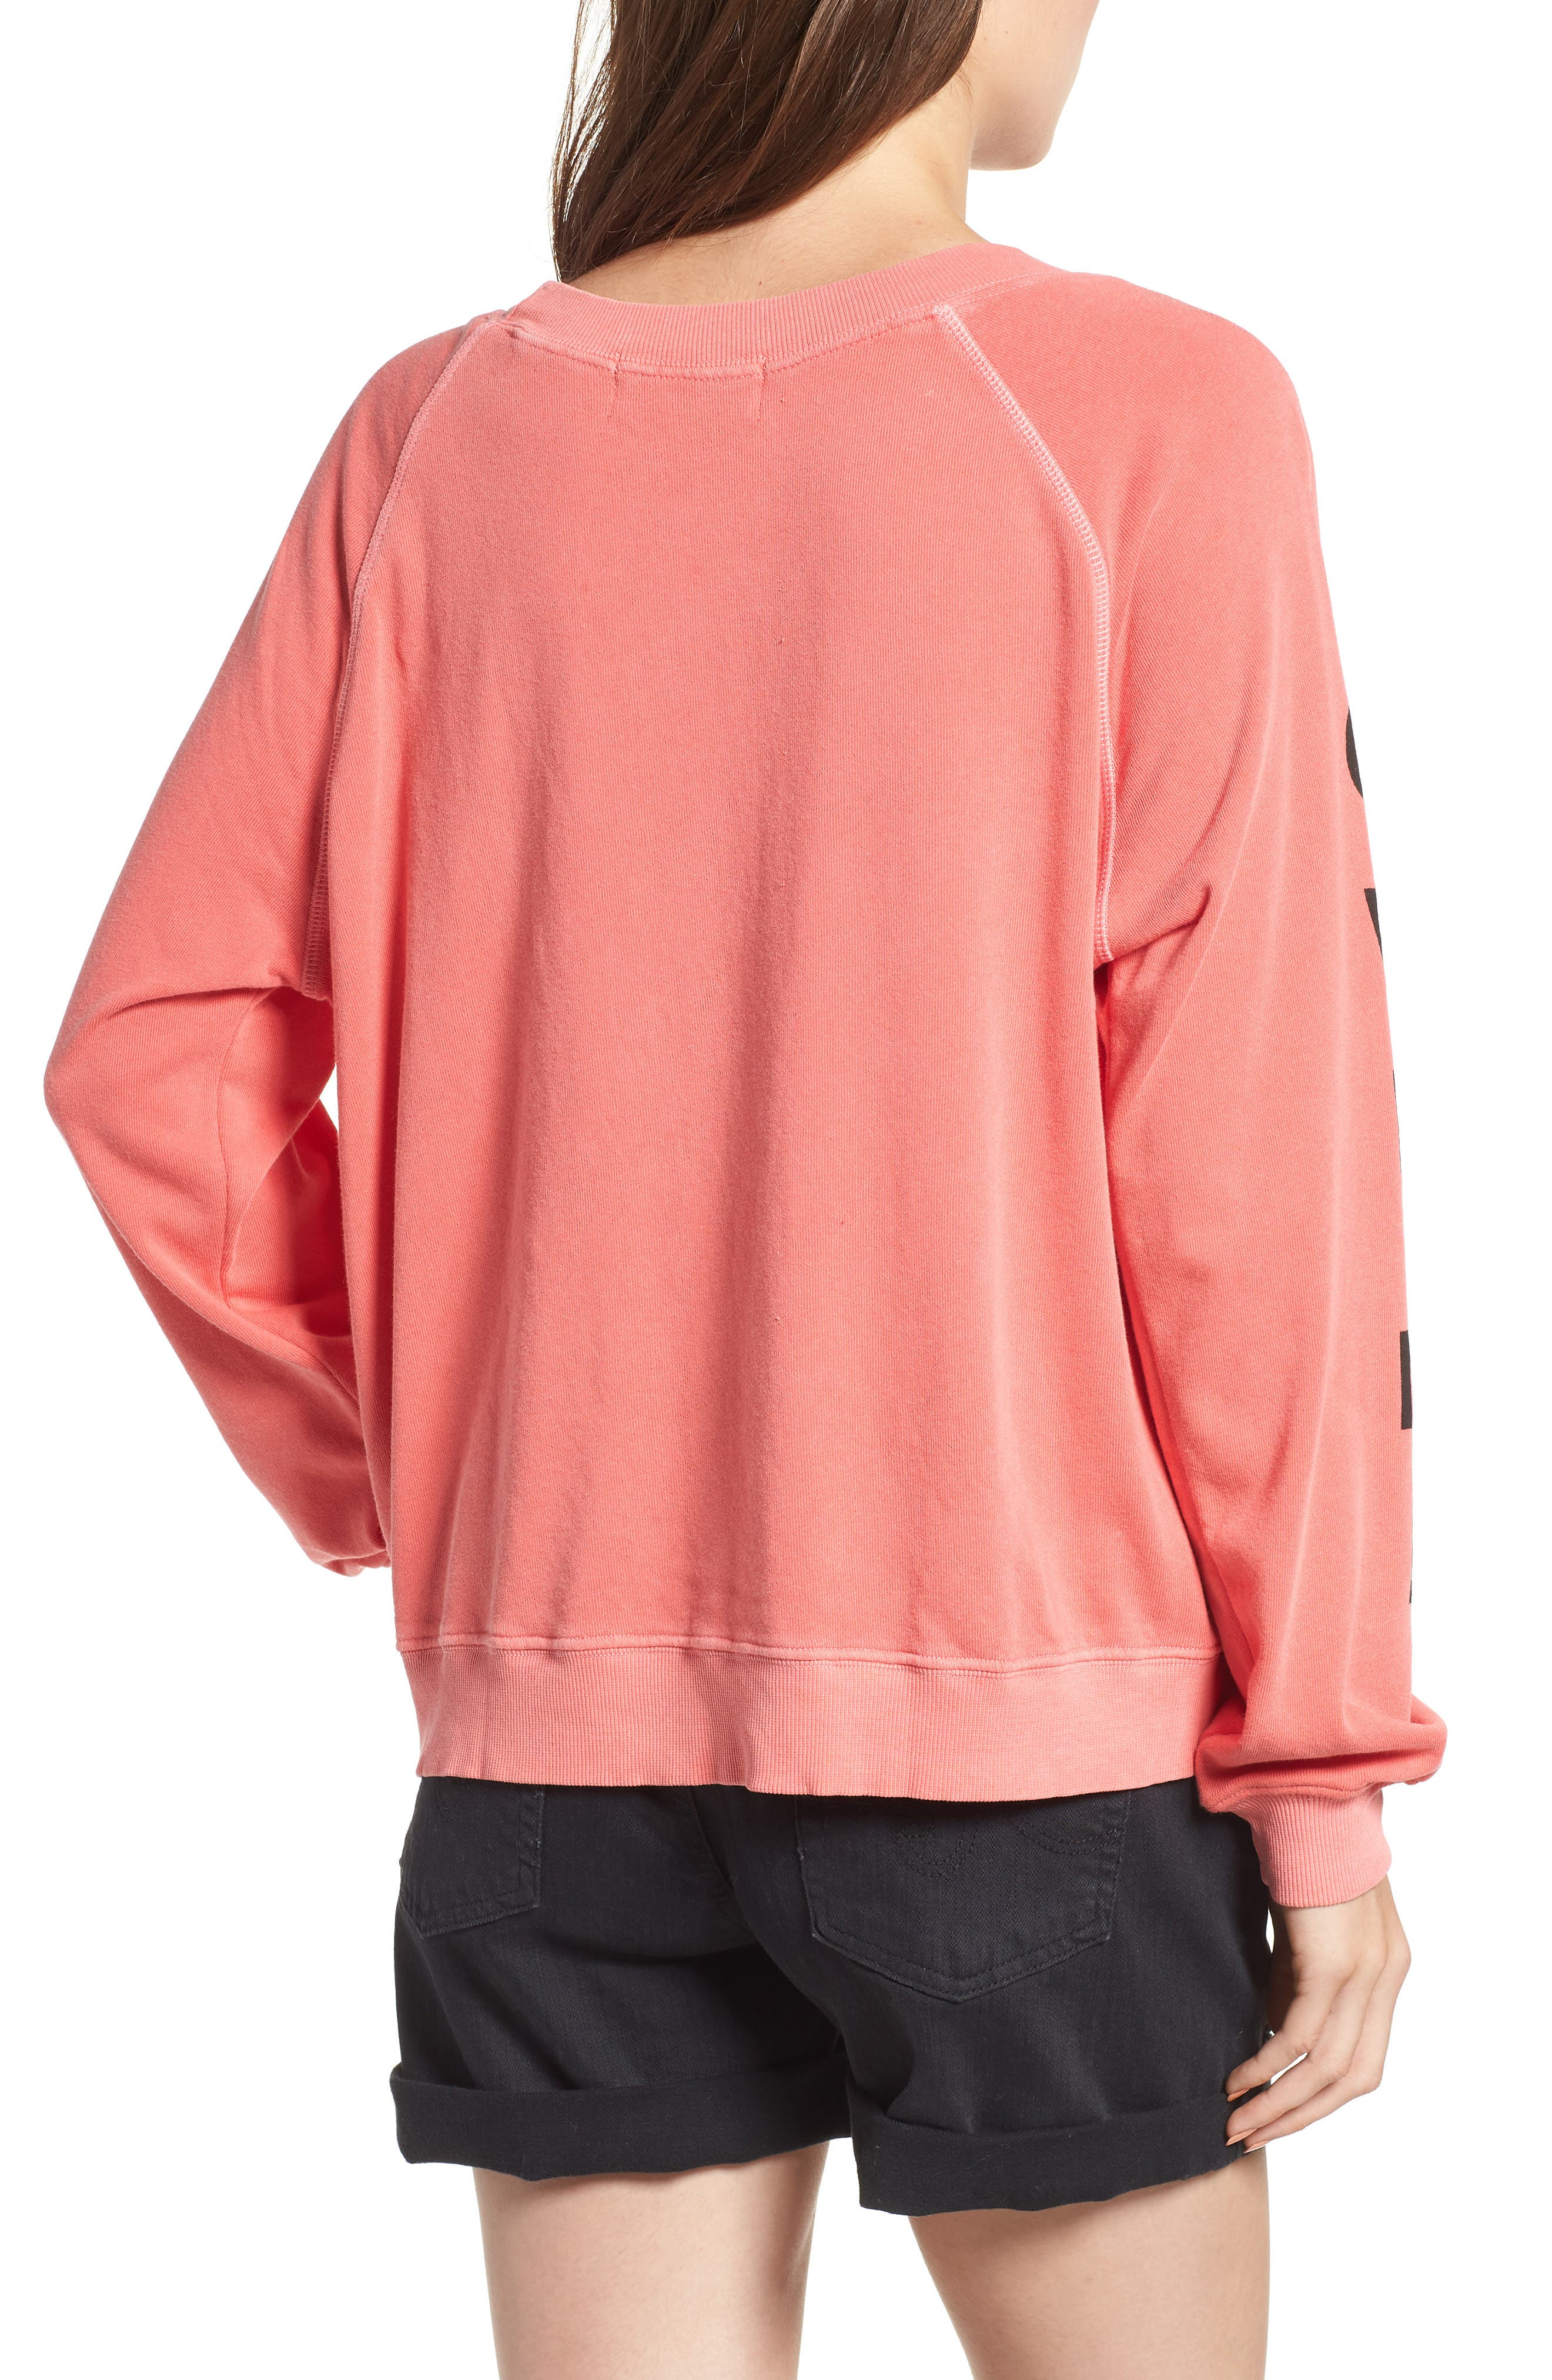 Love Me Tender Sommers Sweatshirt,                             Alternate thumbnail 2, color,                             PIGMENT HOT LIPSTICK